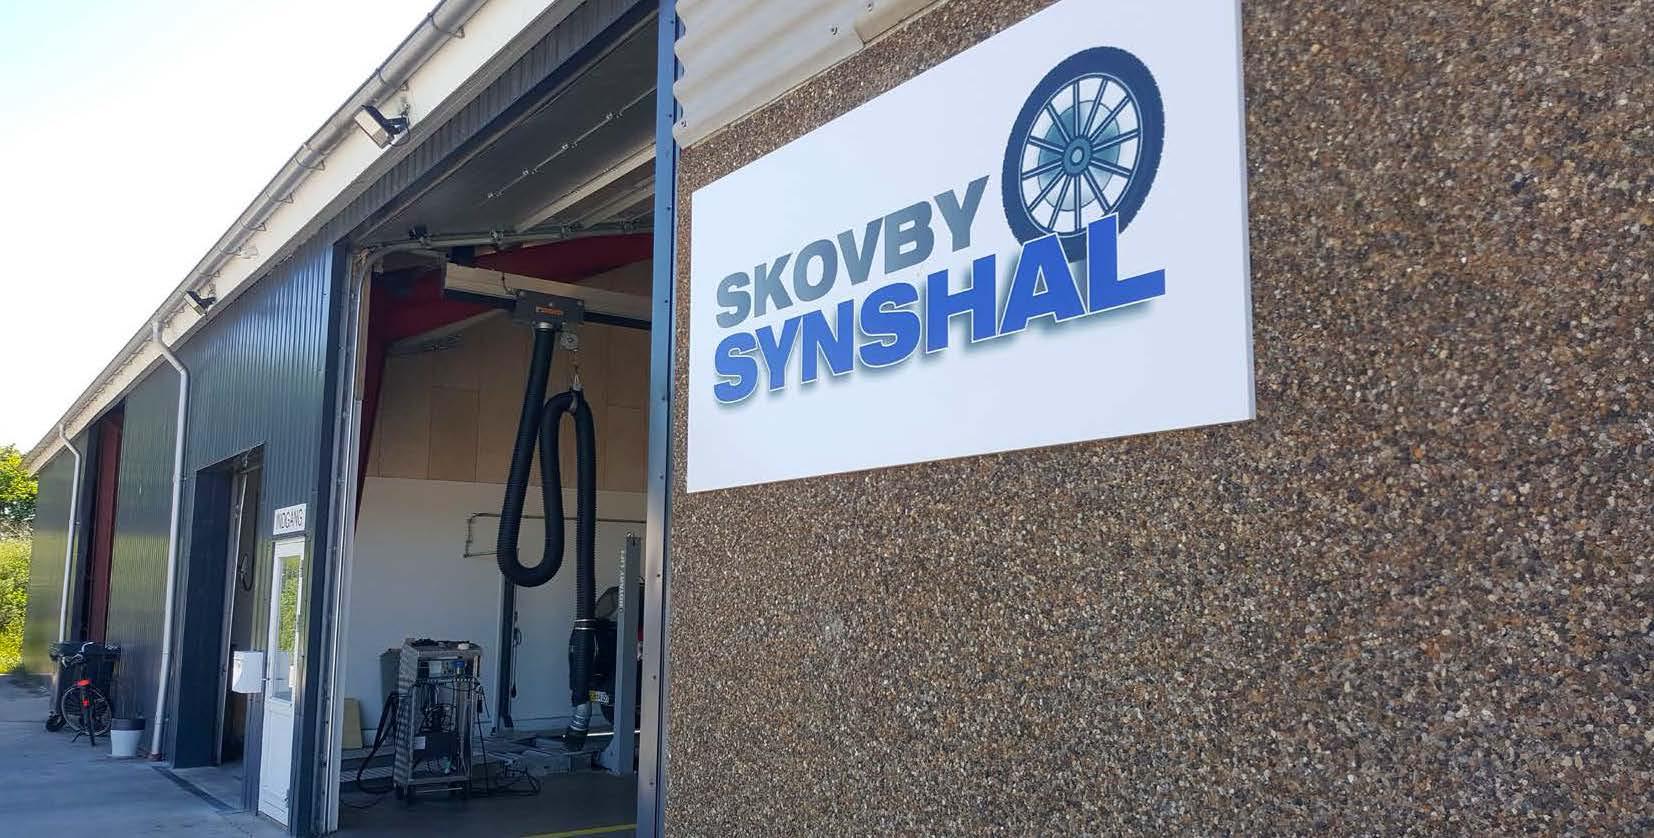 Skovby Synshal